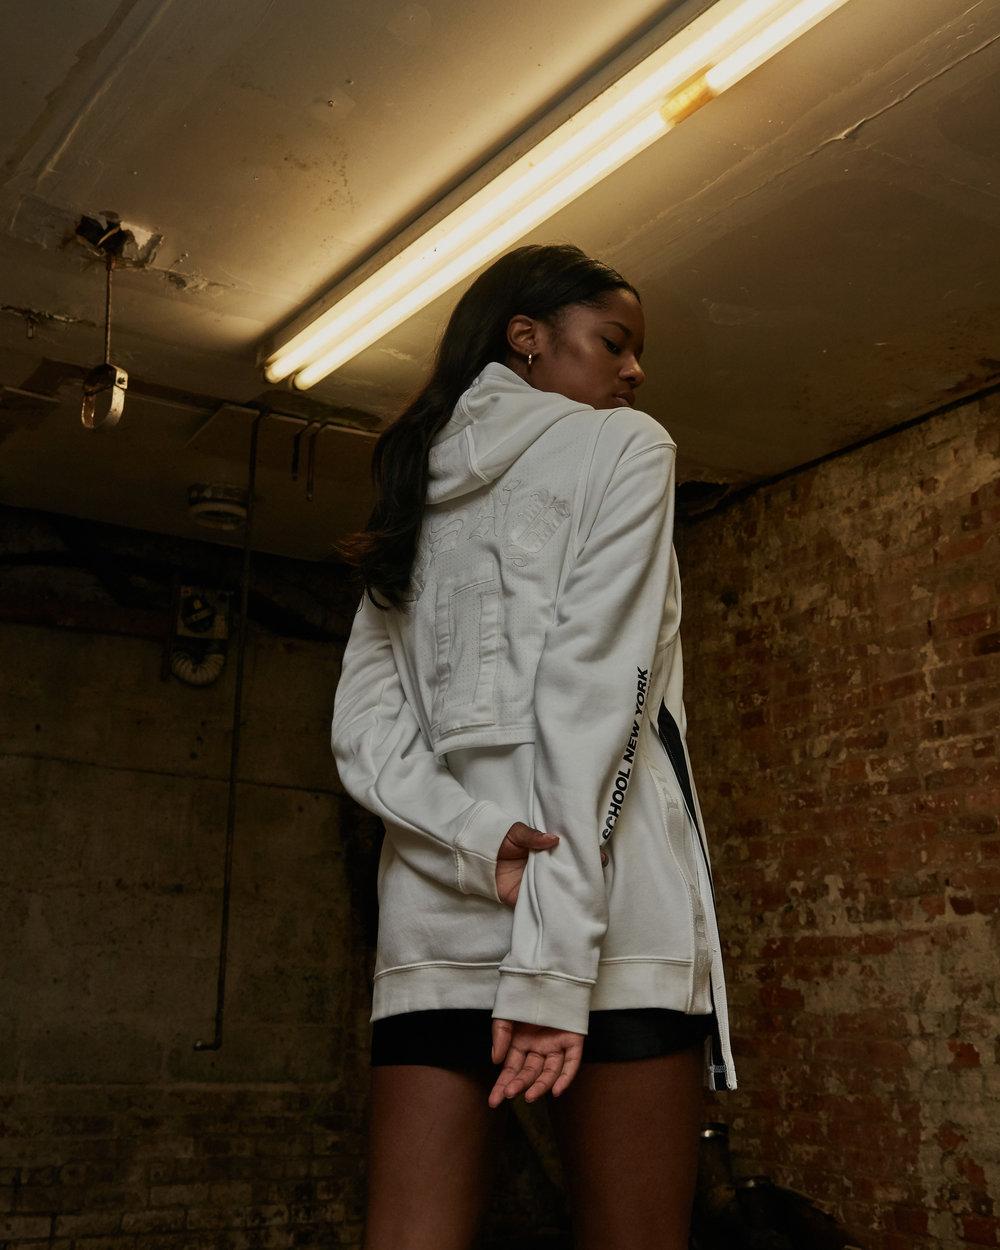 NikePSNY-product6429.jpg